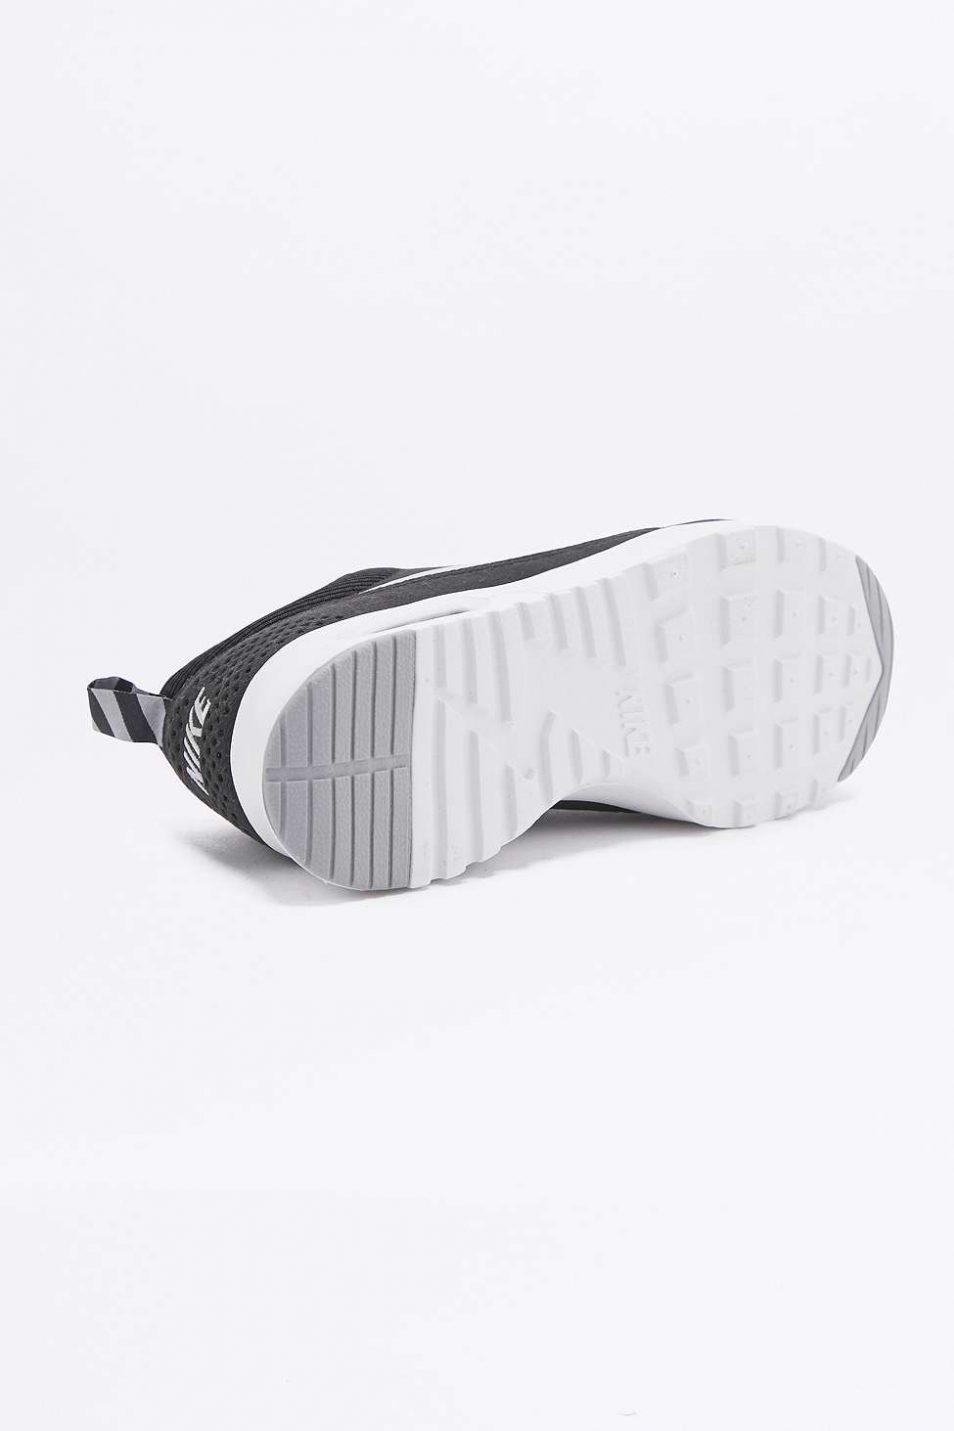 Nike Air Max Thea Black and White Trainers 5